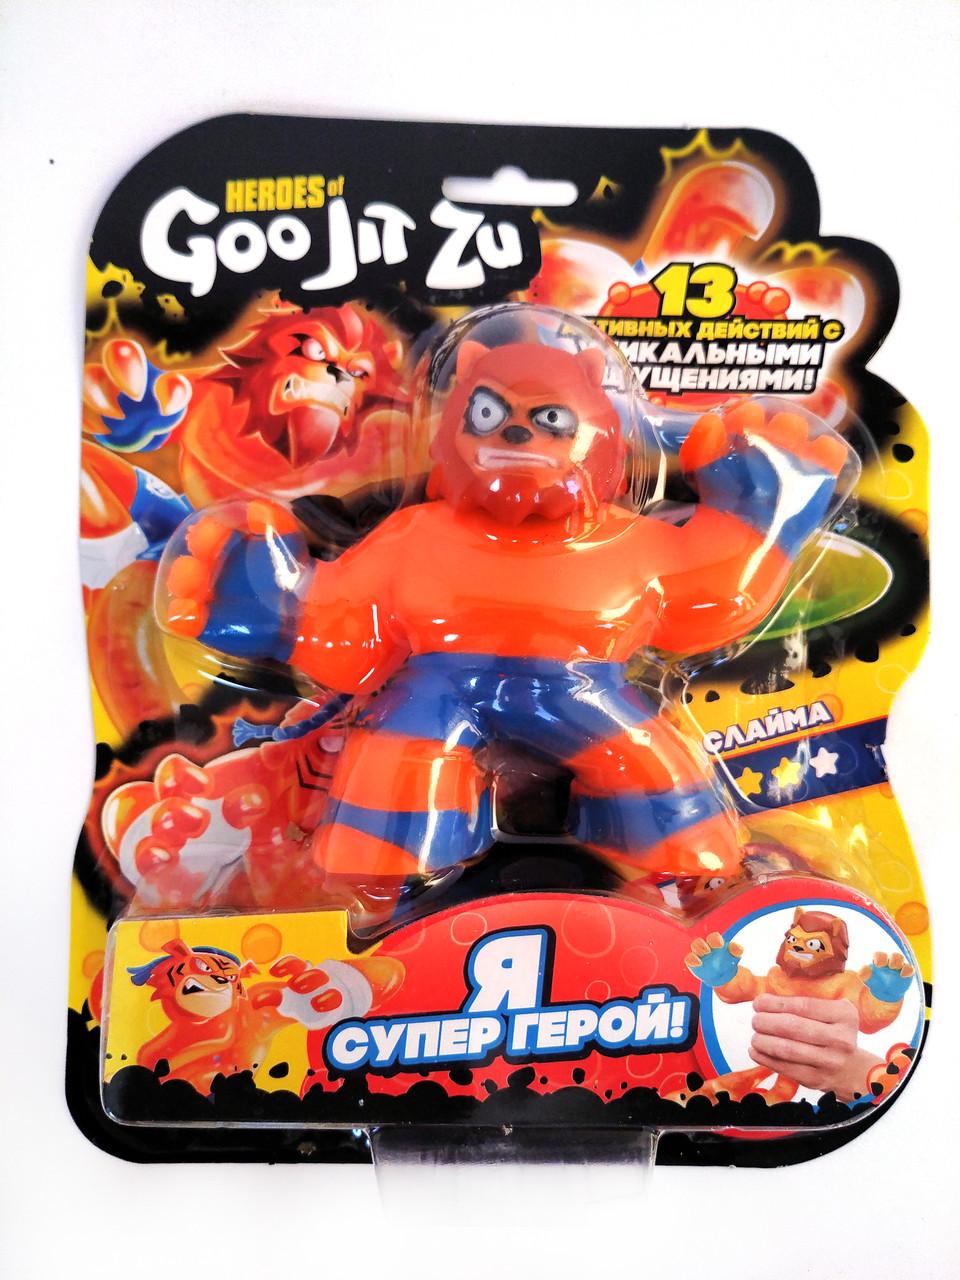 Стретч-антистресс Goo Jit Zu игрушка тянучка Гуджистсу супергерой Сахарио